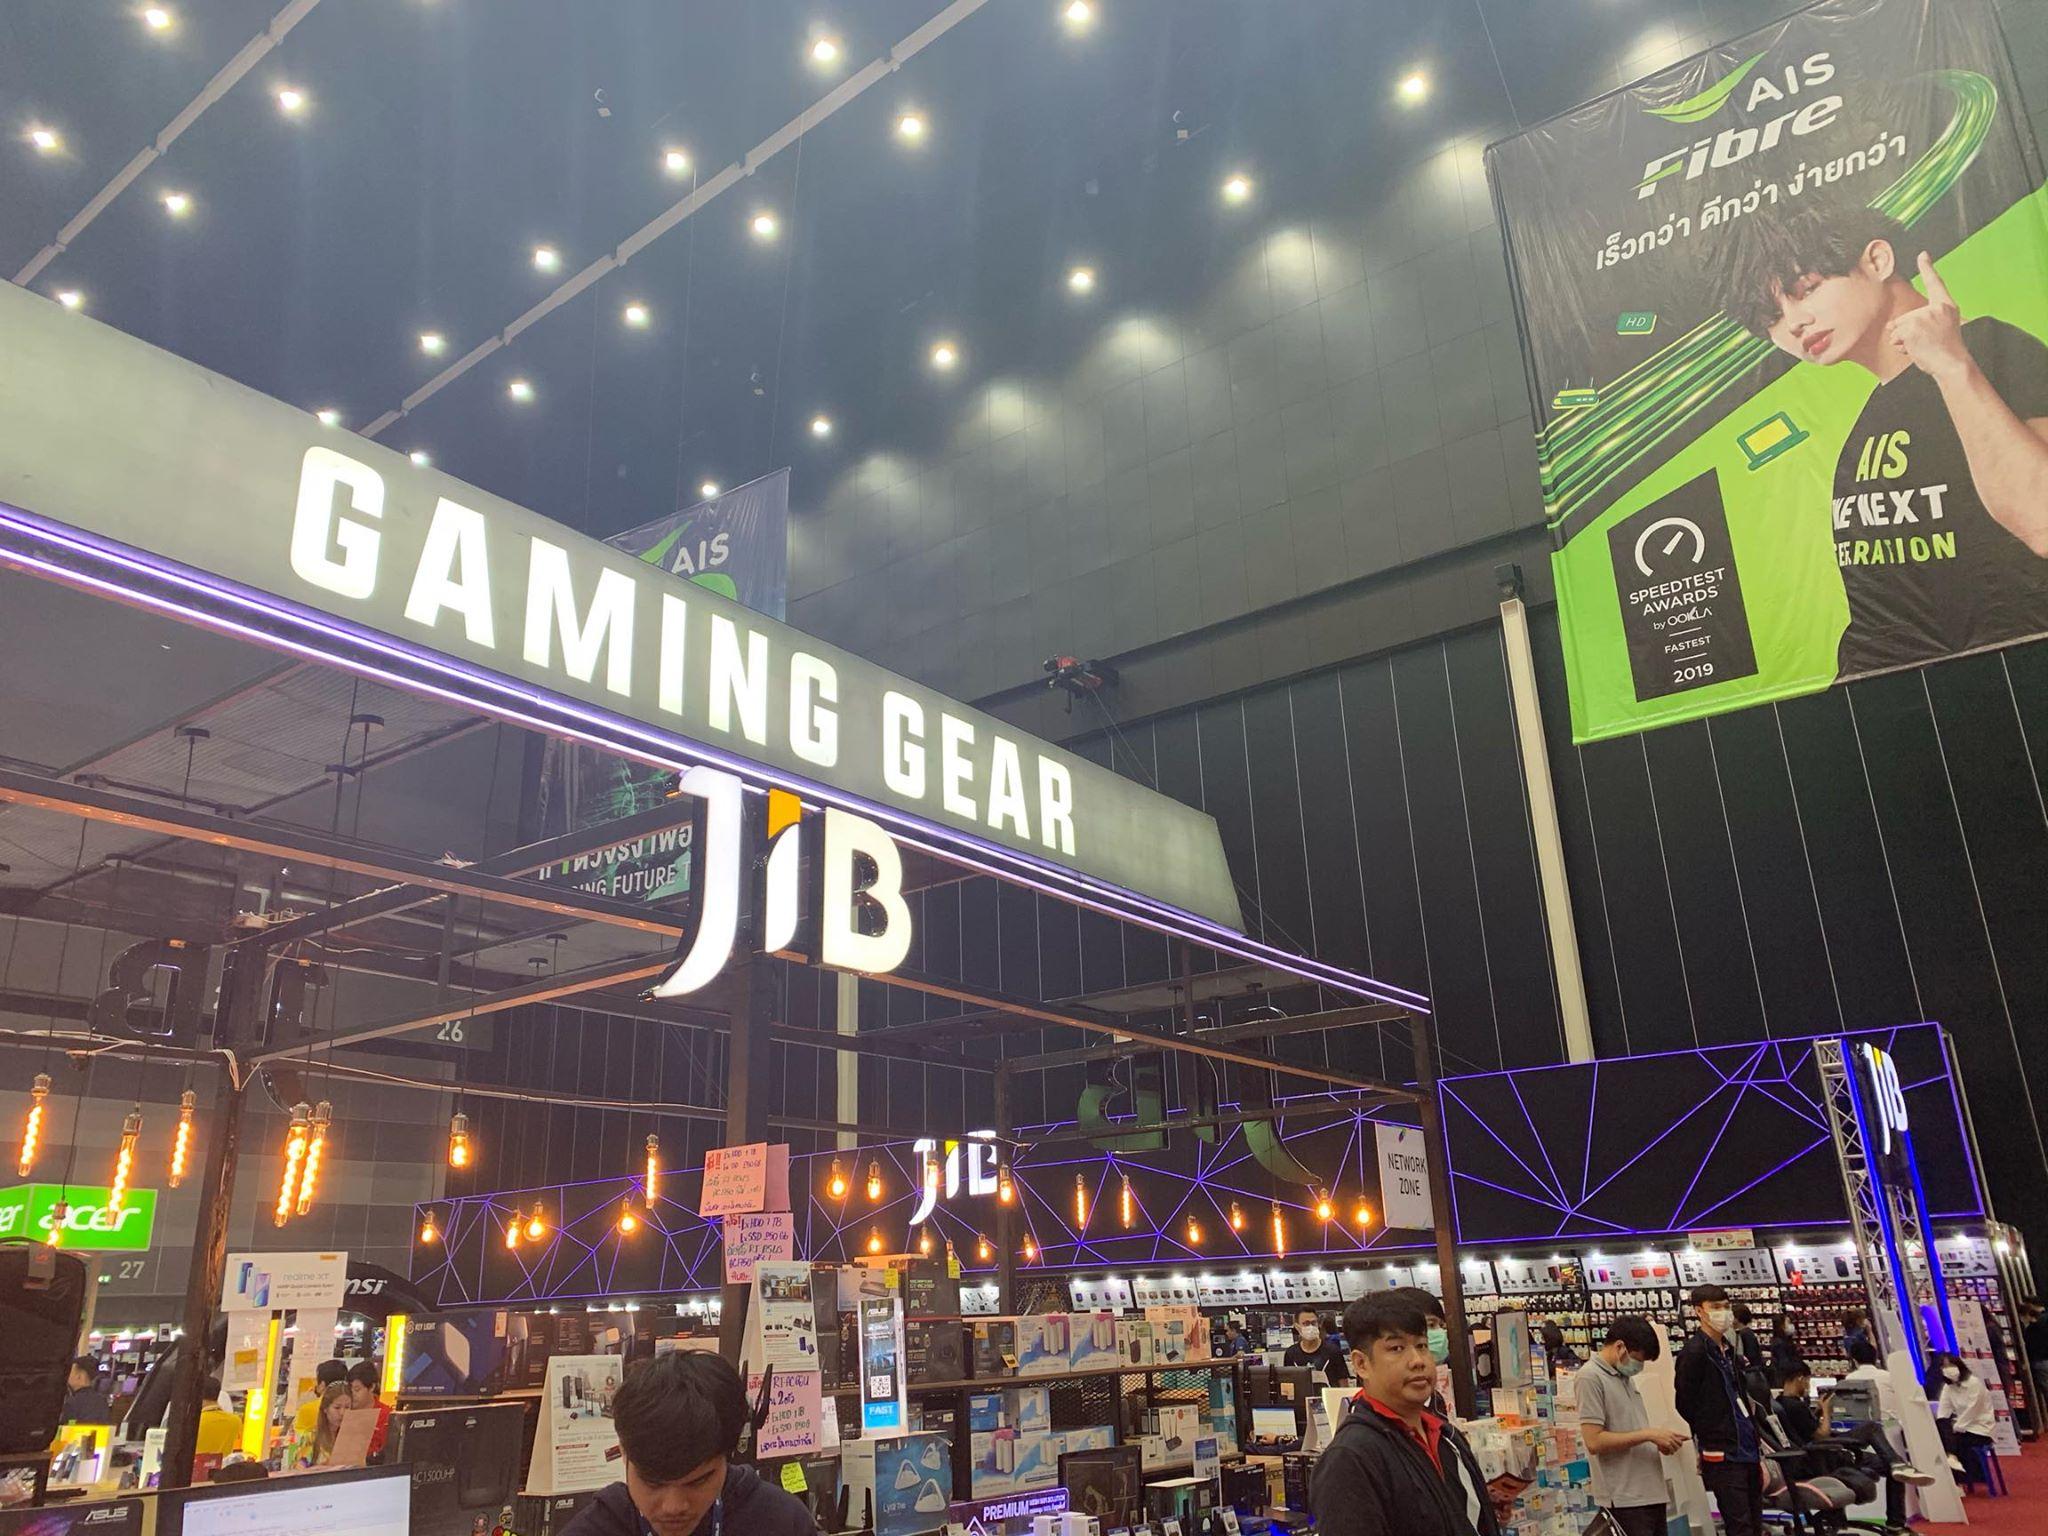 Thailand Game Expo 3112020 1